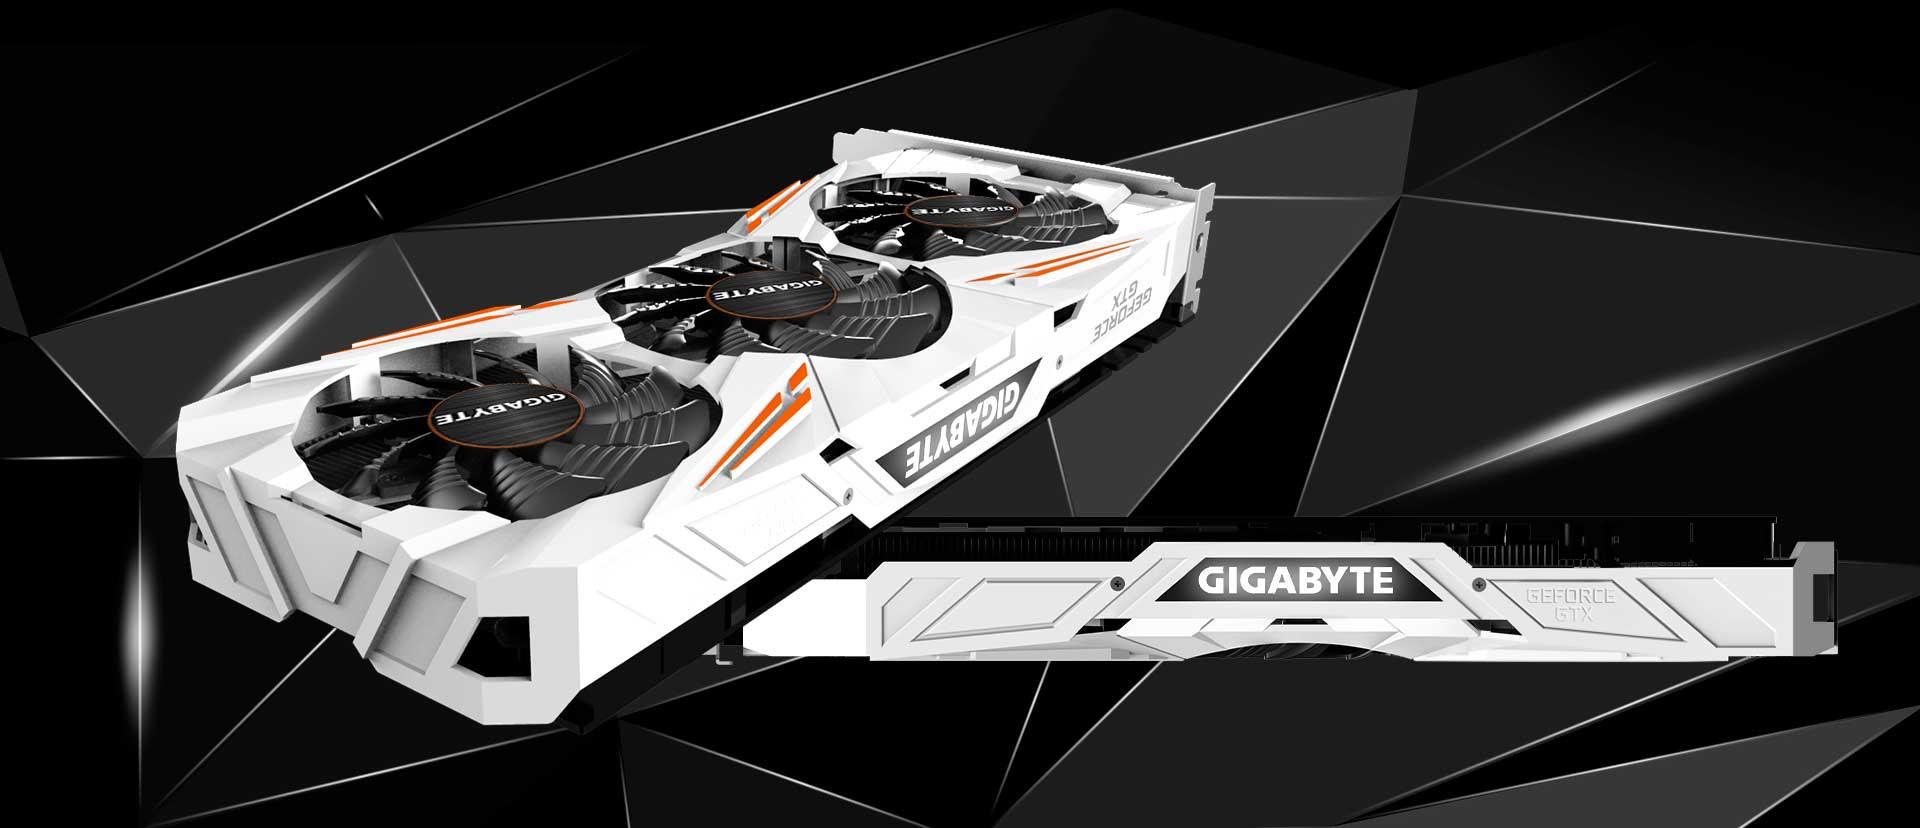 GIGABYTE 1080 Ti OC Edition